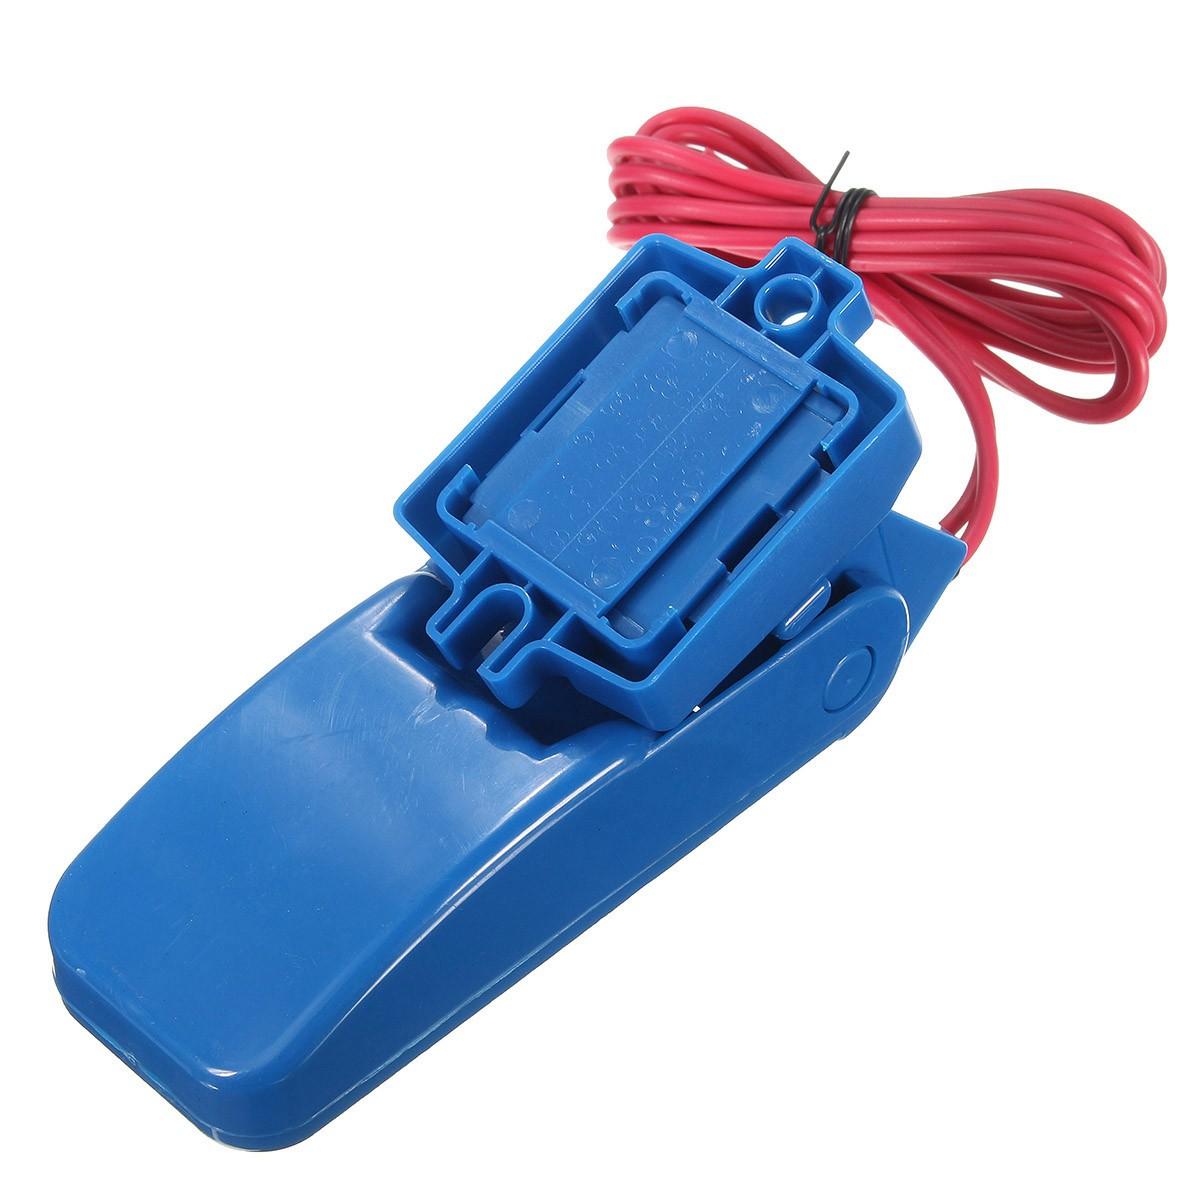 MK-CFS12 Automatic Electric Water Pump Float Switch DC Bilge Pump Switch Flow Sensor